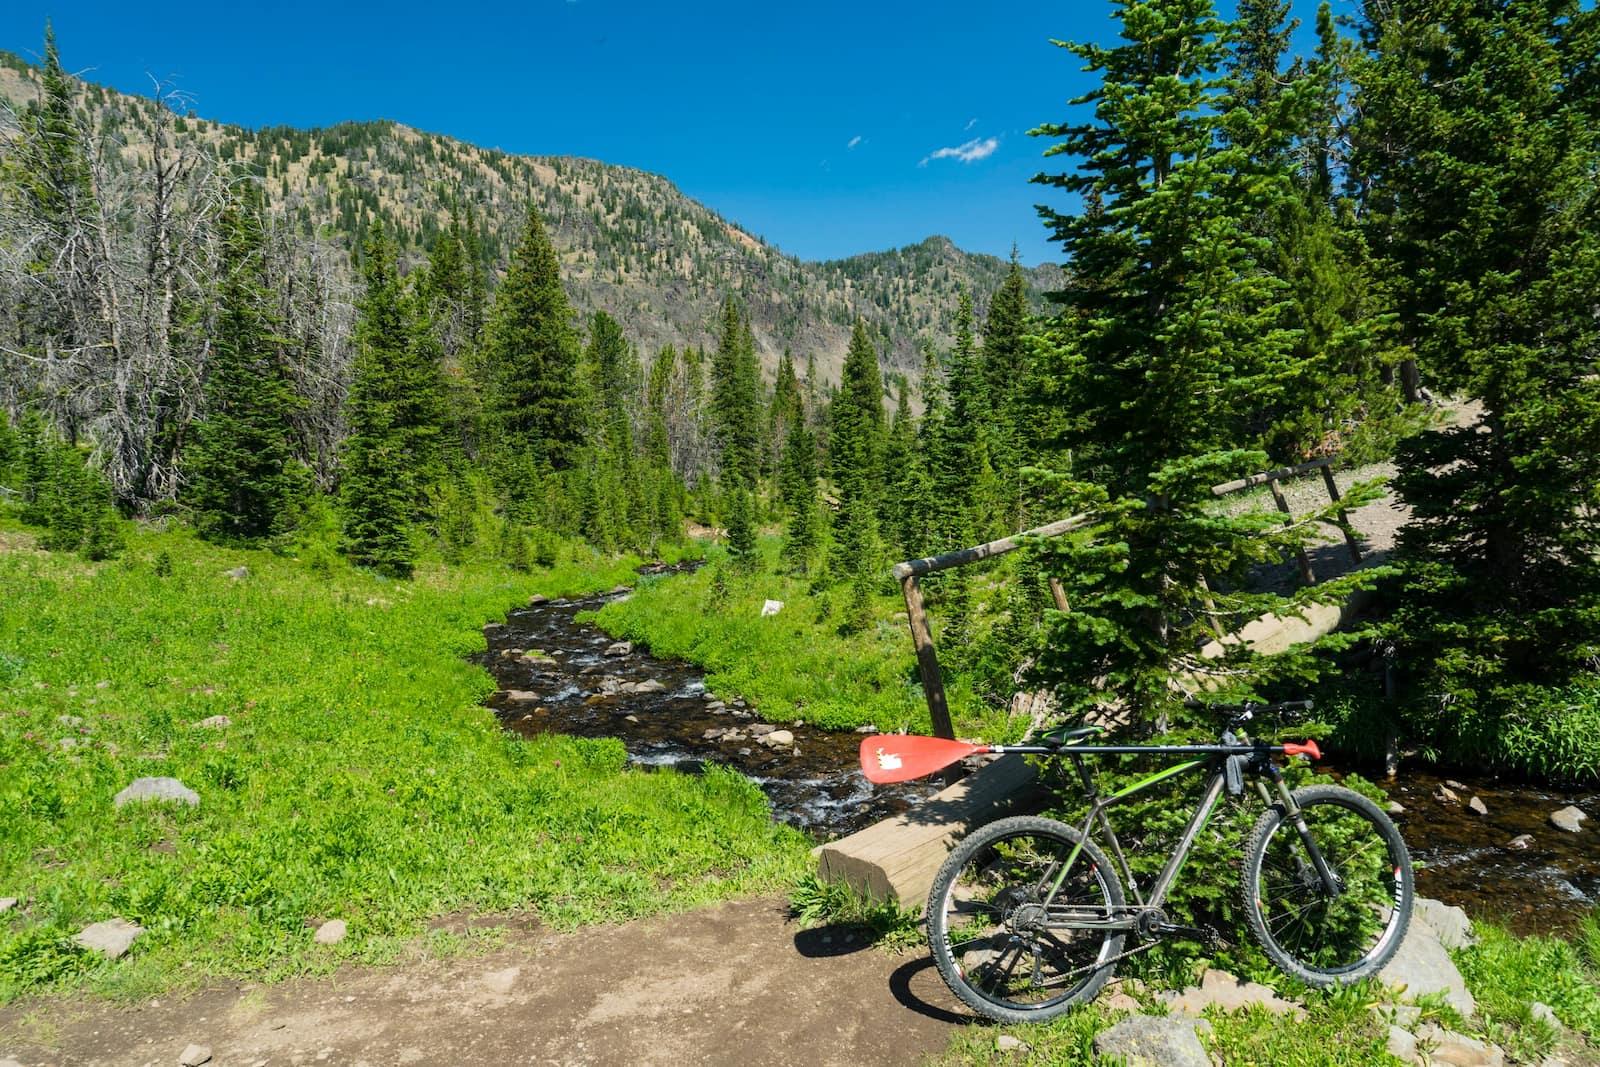 Bike with paddle next to river below Bozeman mountains.